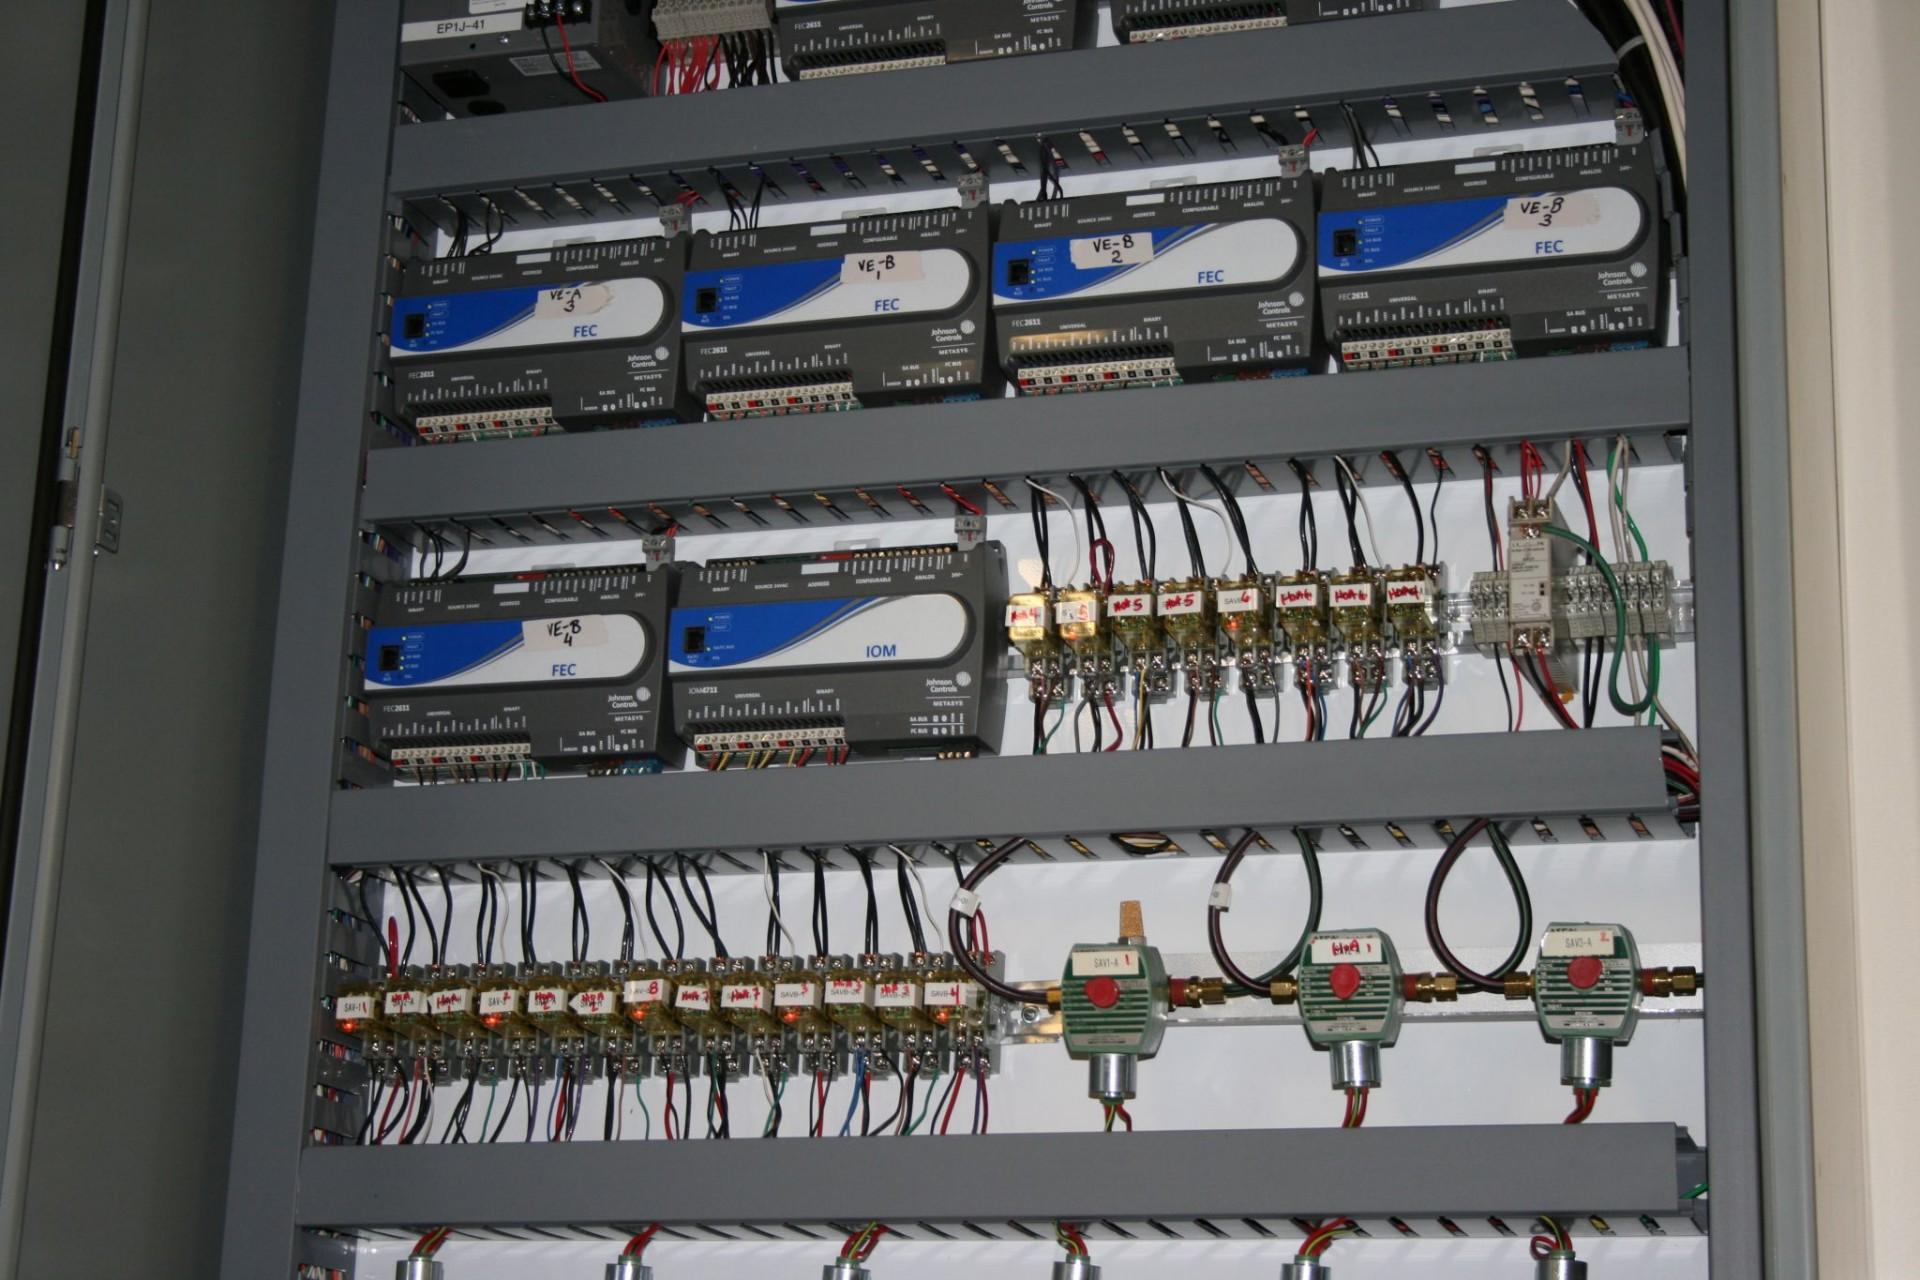 Building Automation System Setup